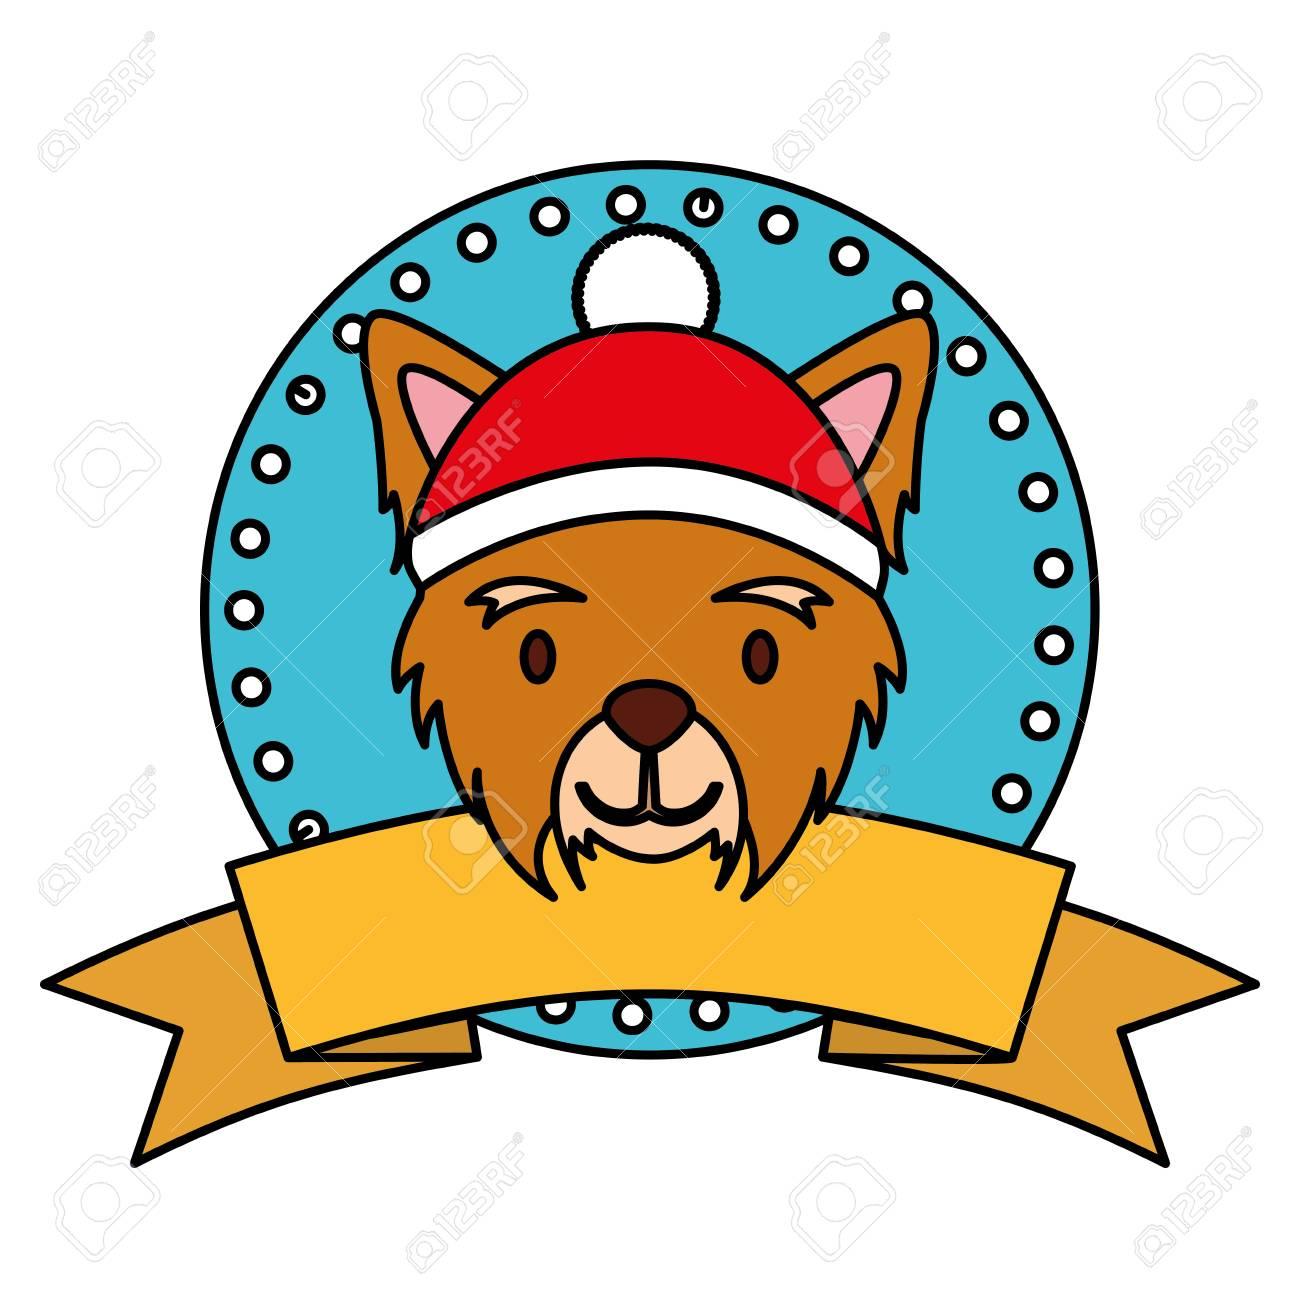 Merry Christmas Ribbon Clipart.Dog Merry Christmas Ribbon Label Vector Illustration